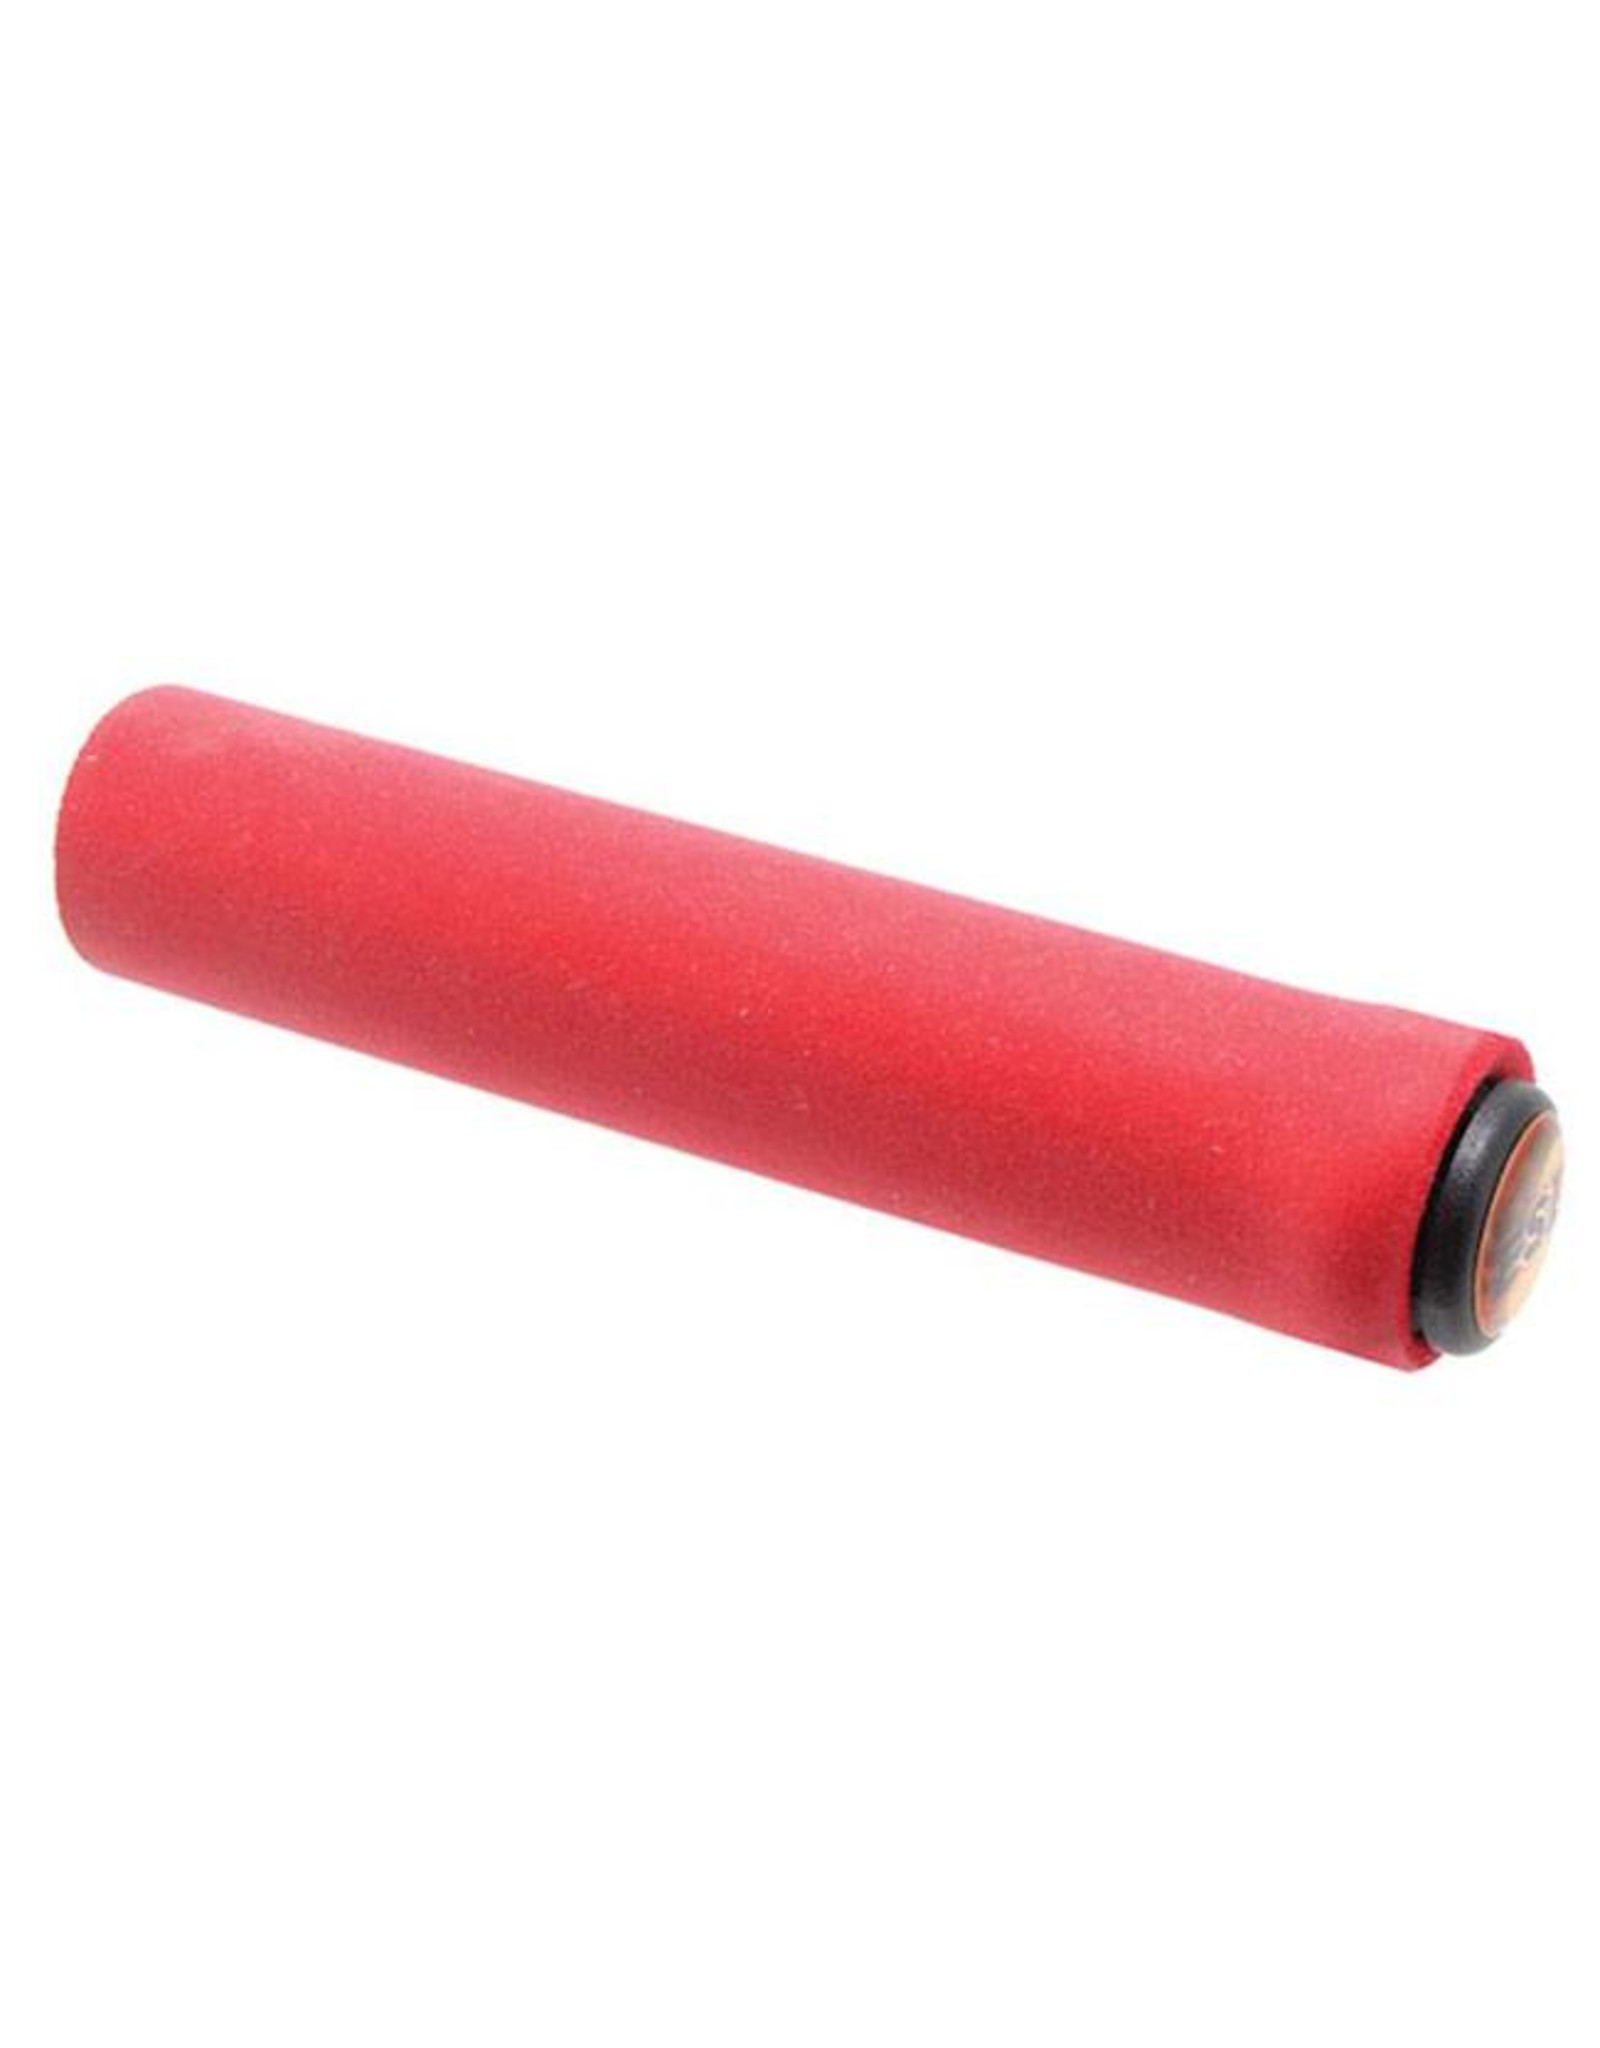 ESI ESI 32mm Chunky Silicone Grips: Red